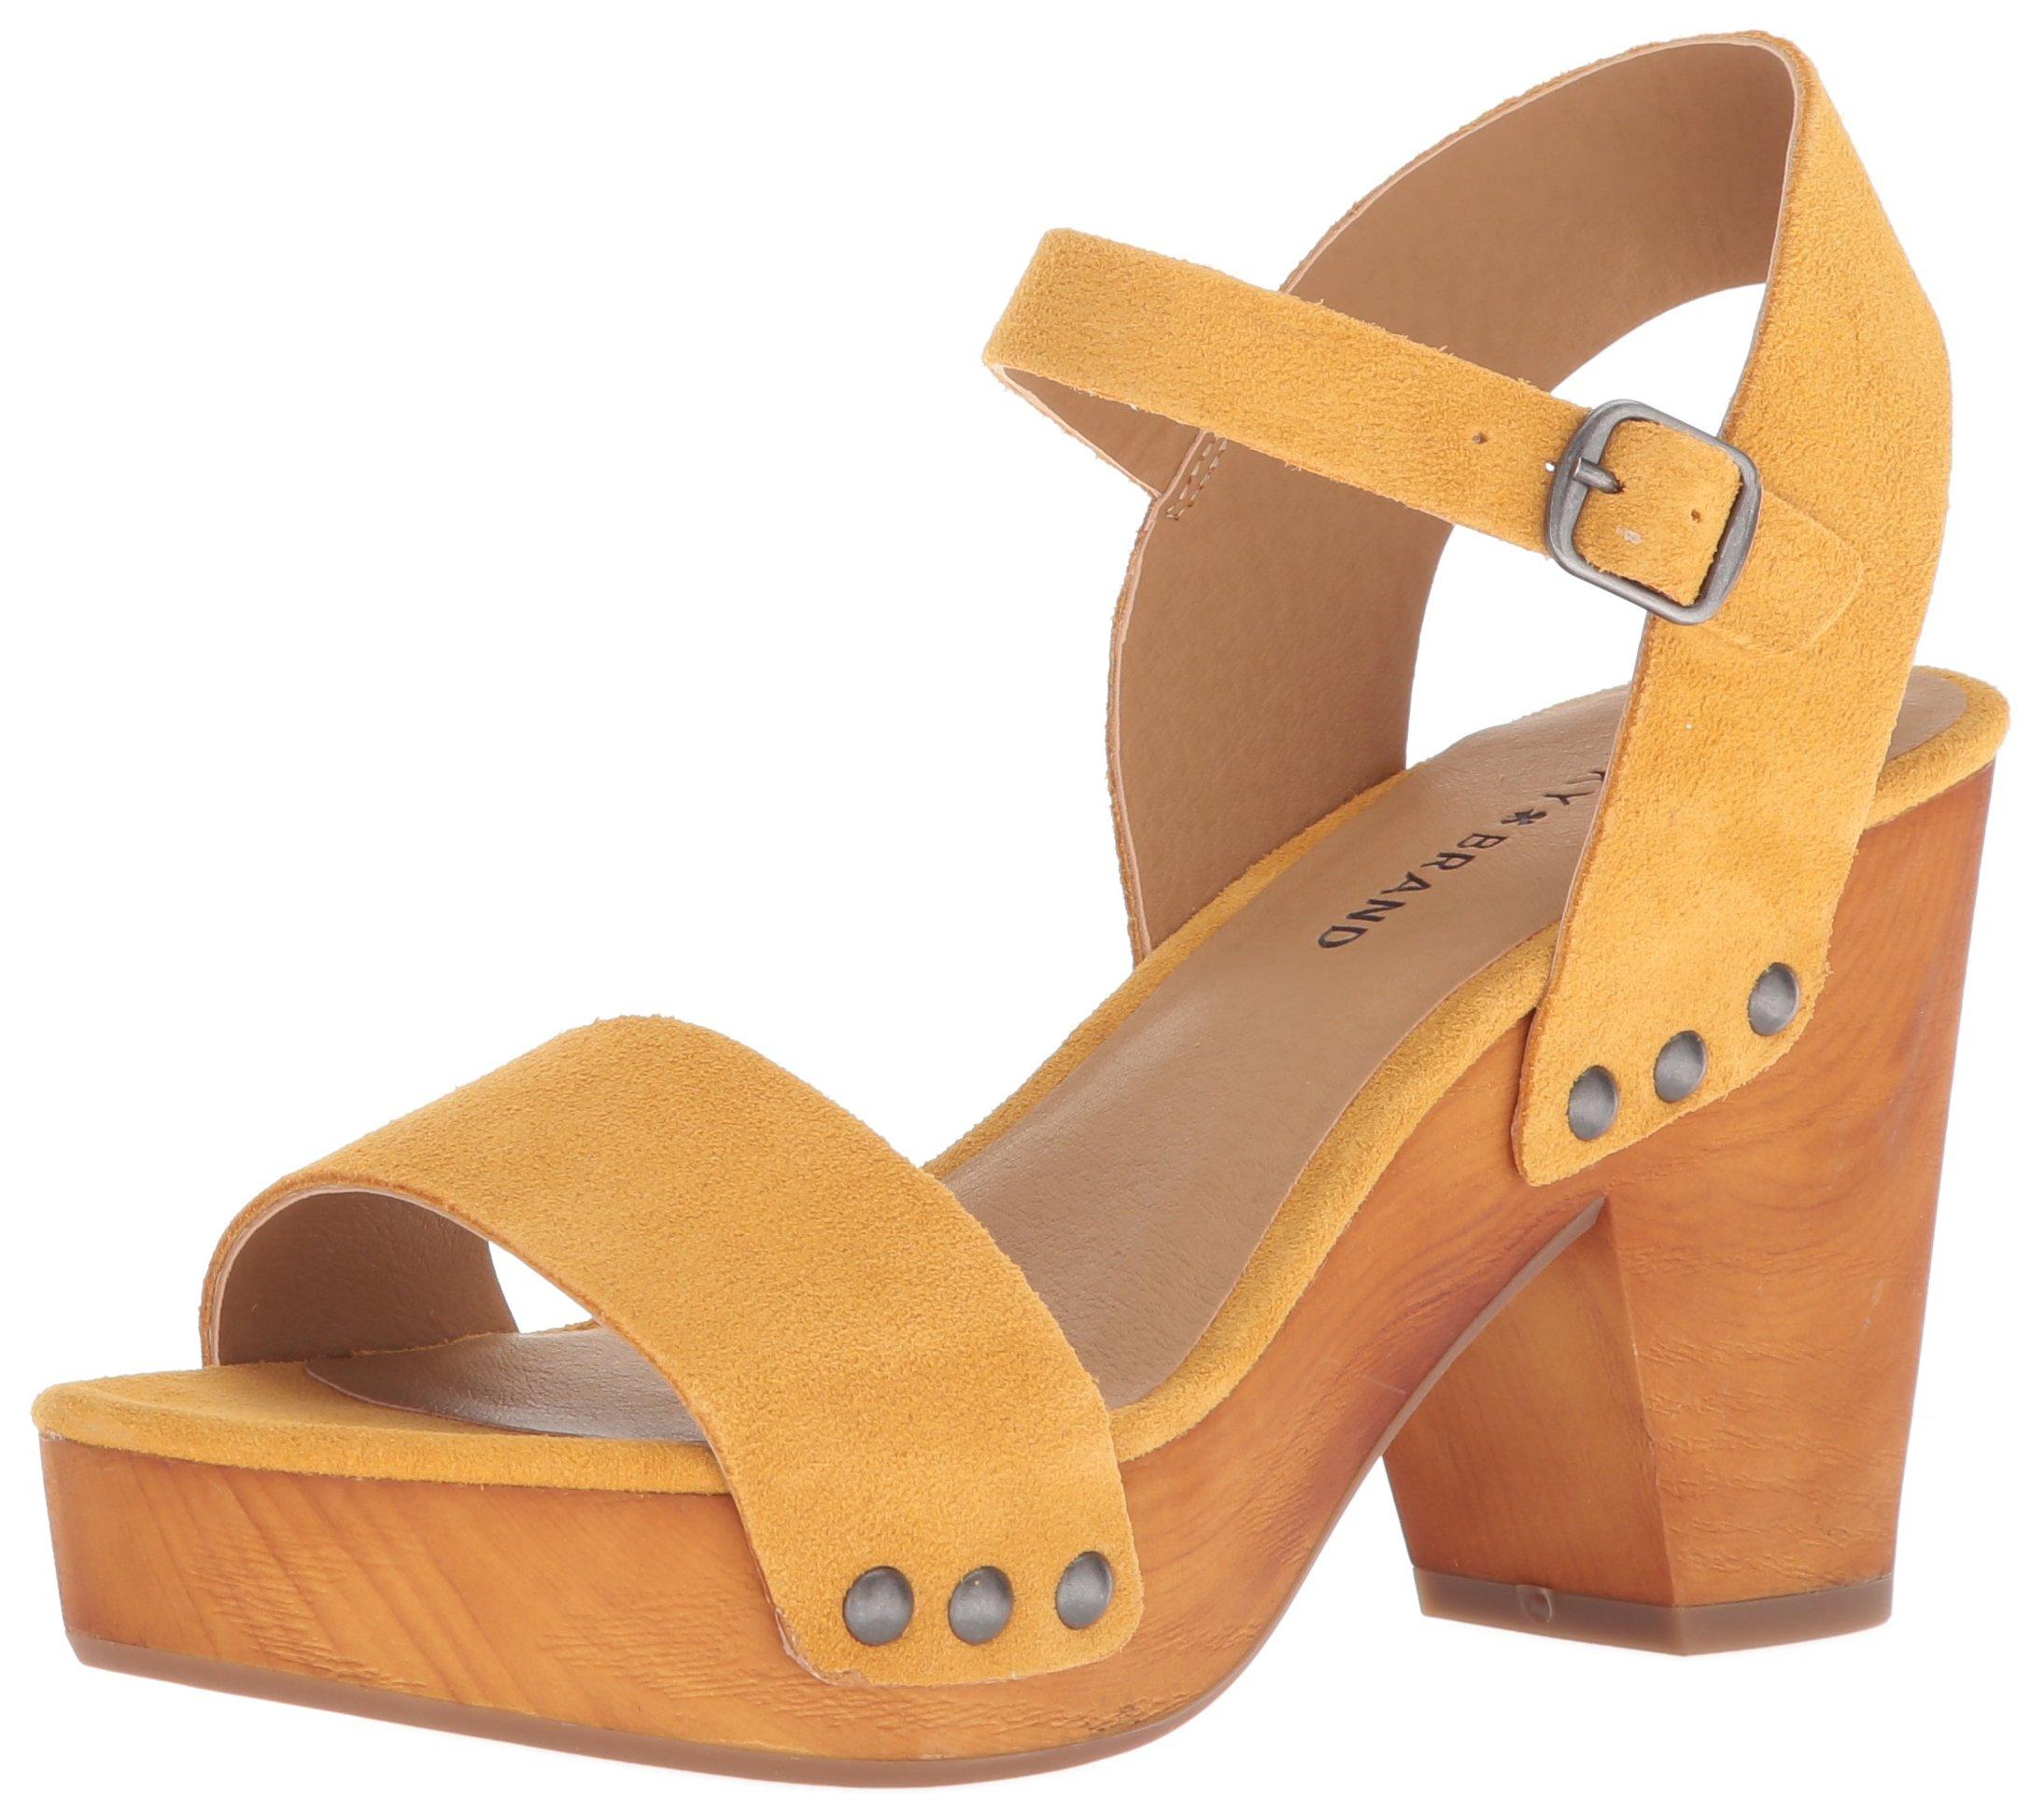 Lucky Women's LK-Trisa Heeled Sandal, Saffron, 8 M US